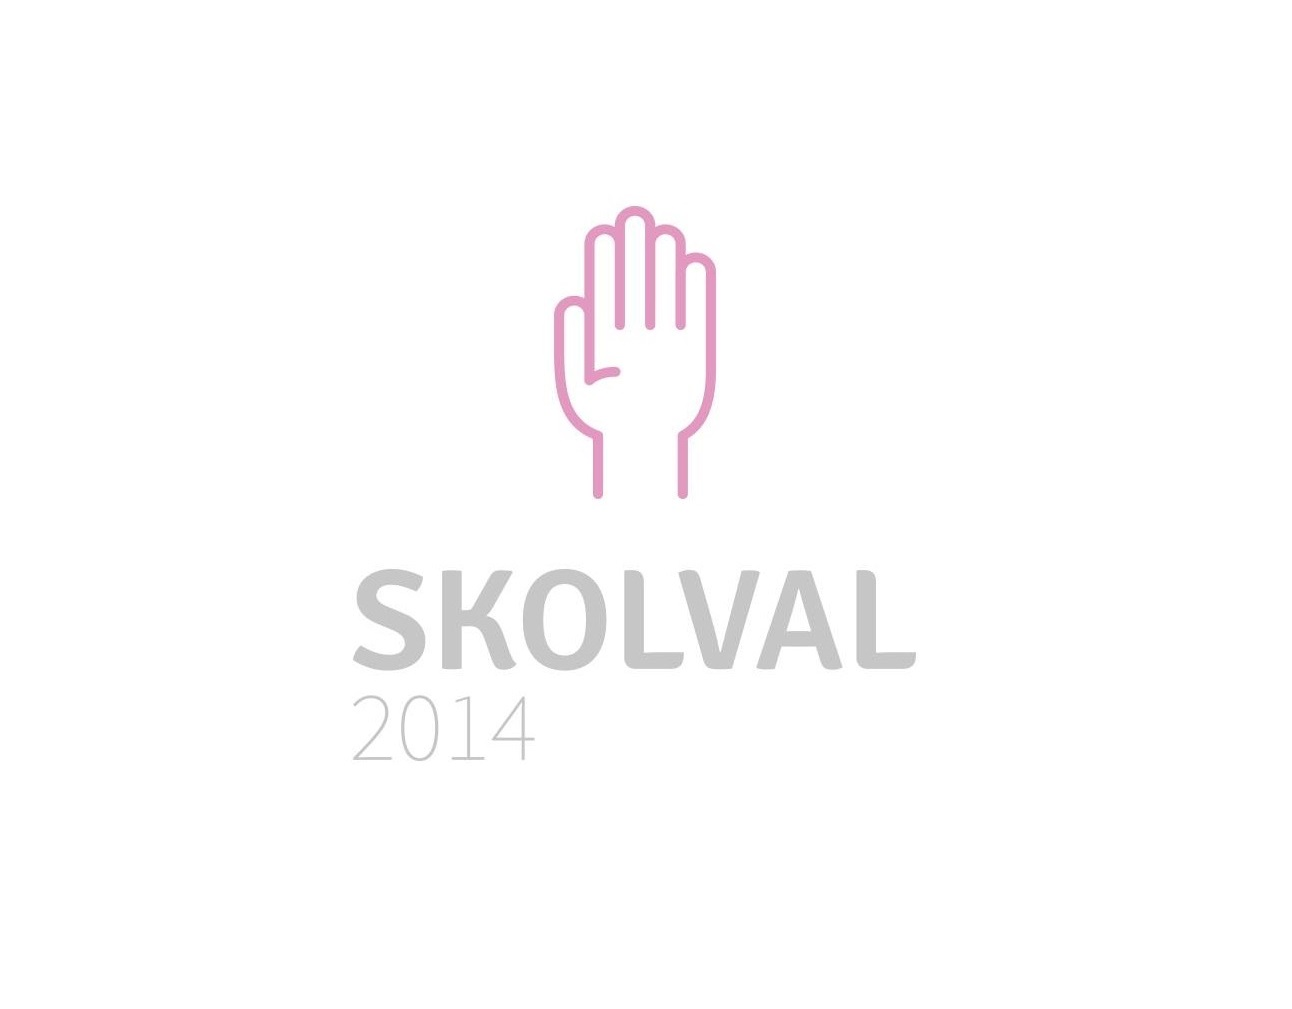 skolval_2014_0